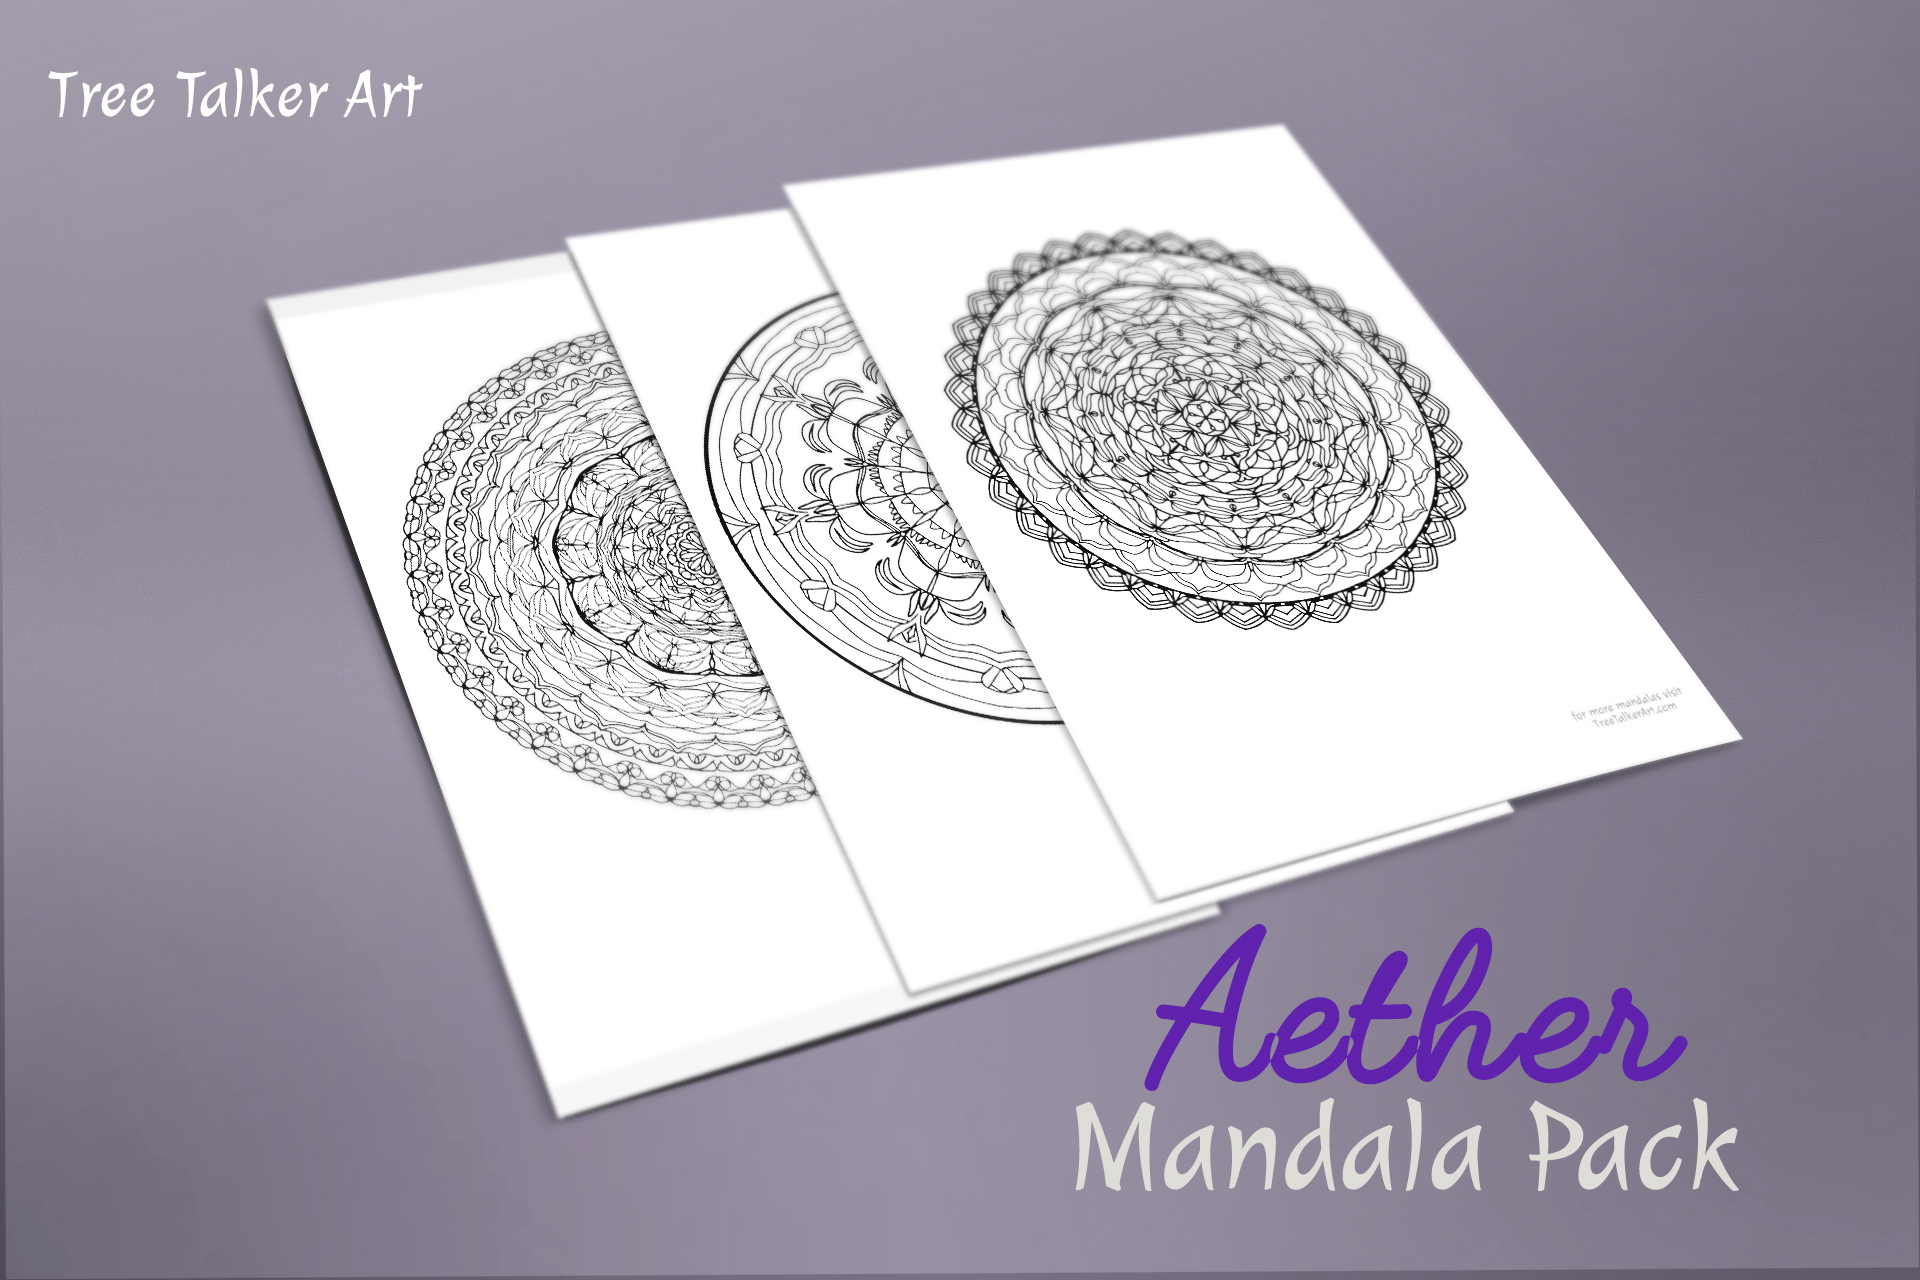 Aether Downloadable Mandala Meditation Pack | Tree Talker Art